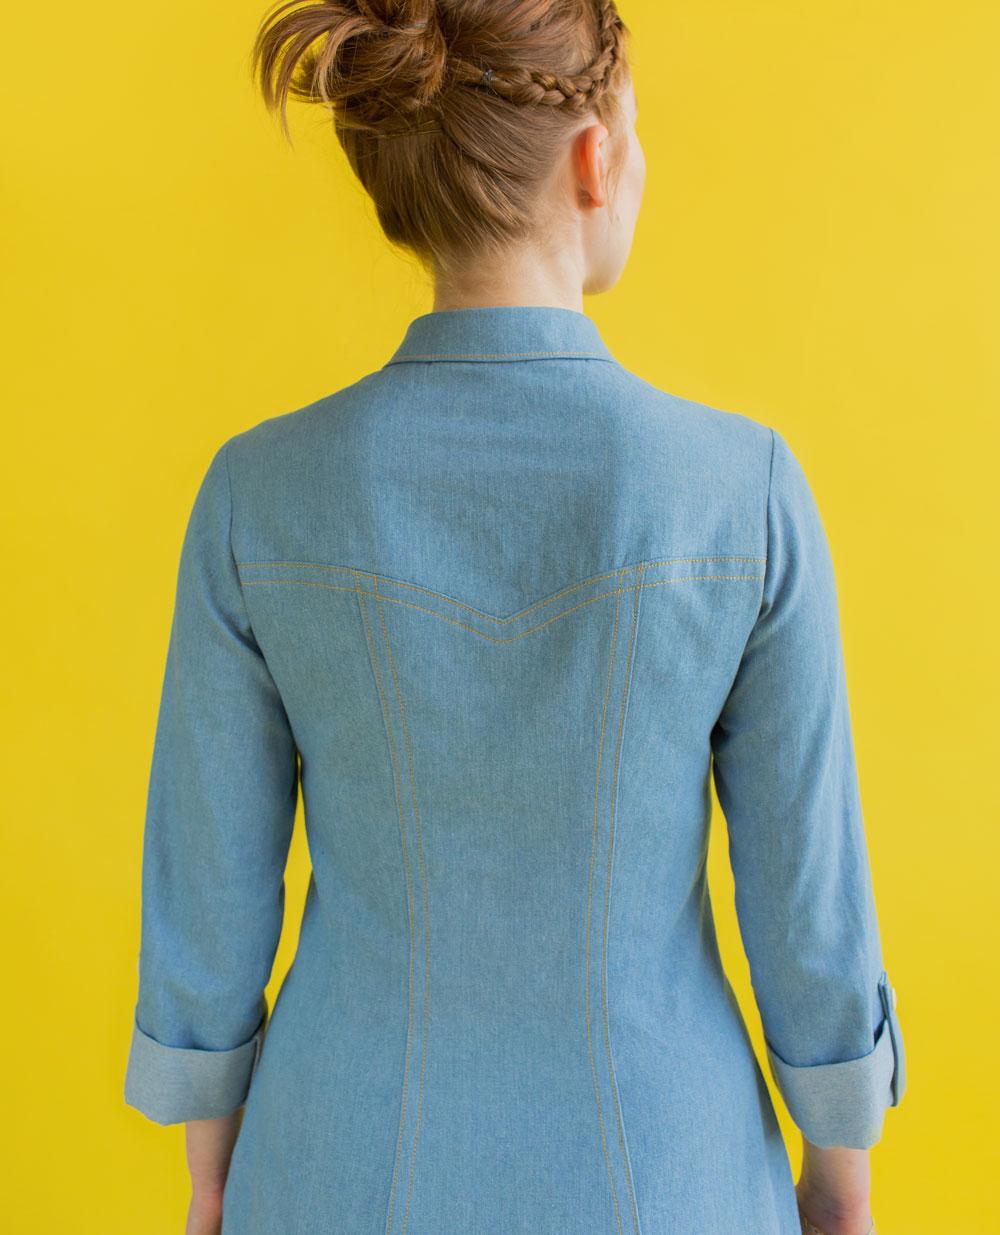 Rosa shirt sewing pattern